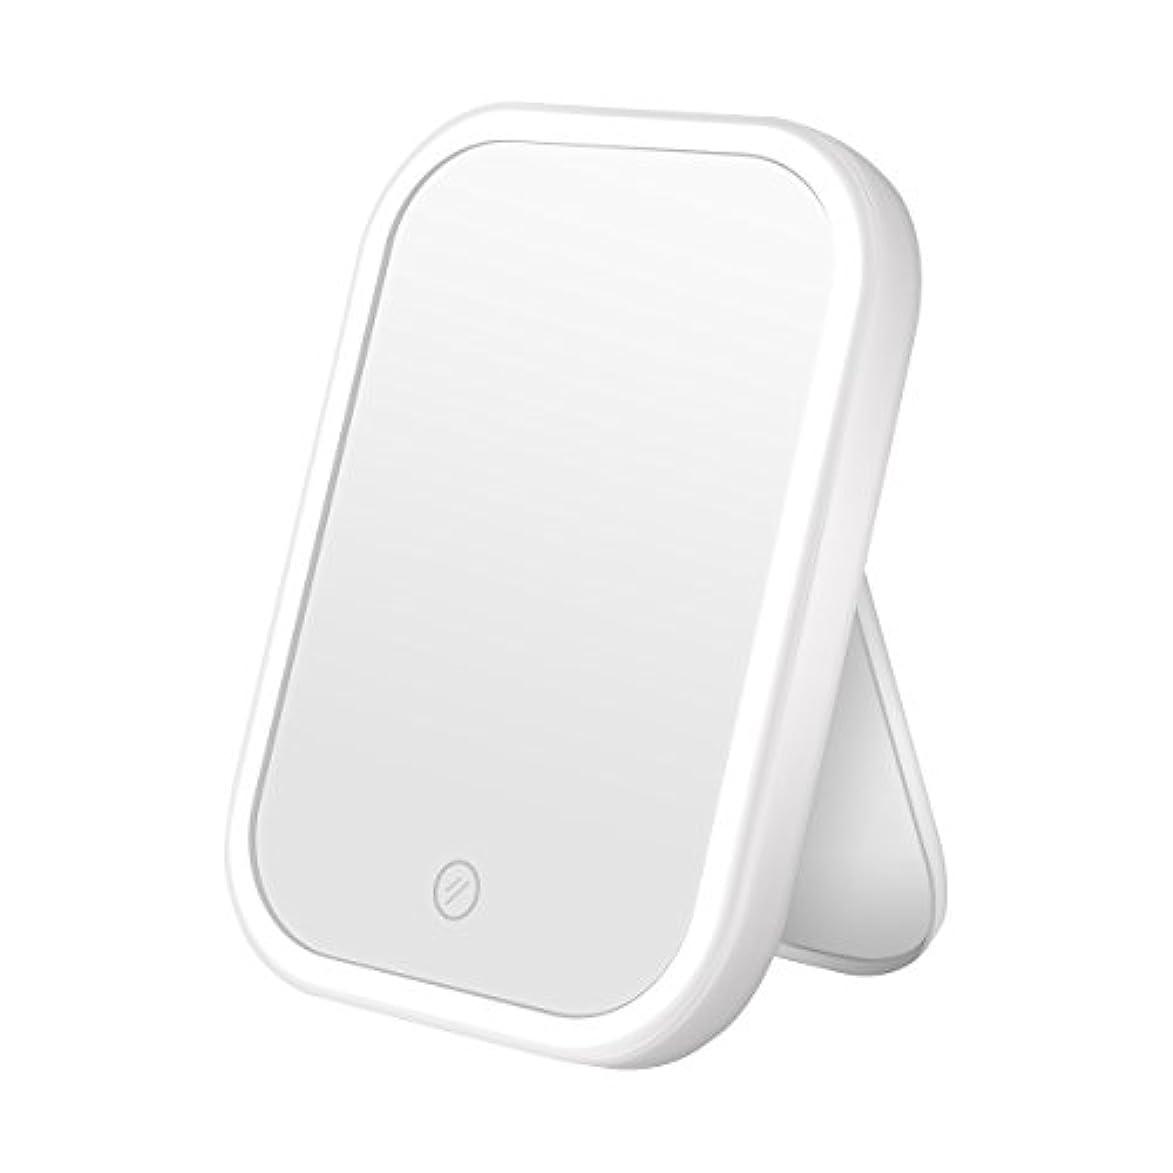 CERSLIMO 4と照明付き 化粧鏡がテープライトは操作タッチスクリーンスイッチ電池またはUSBでライト調光可能なテーブル カウンター化粧鏡付き化粧鏡を移動導きました ホワイト-電池またはUSBケーブル